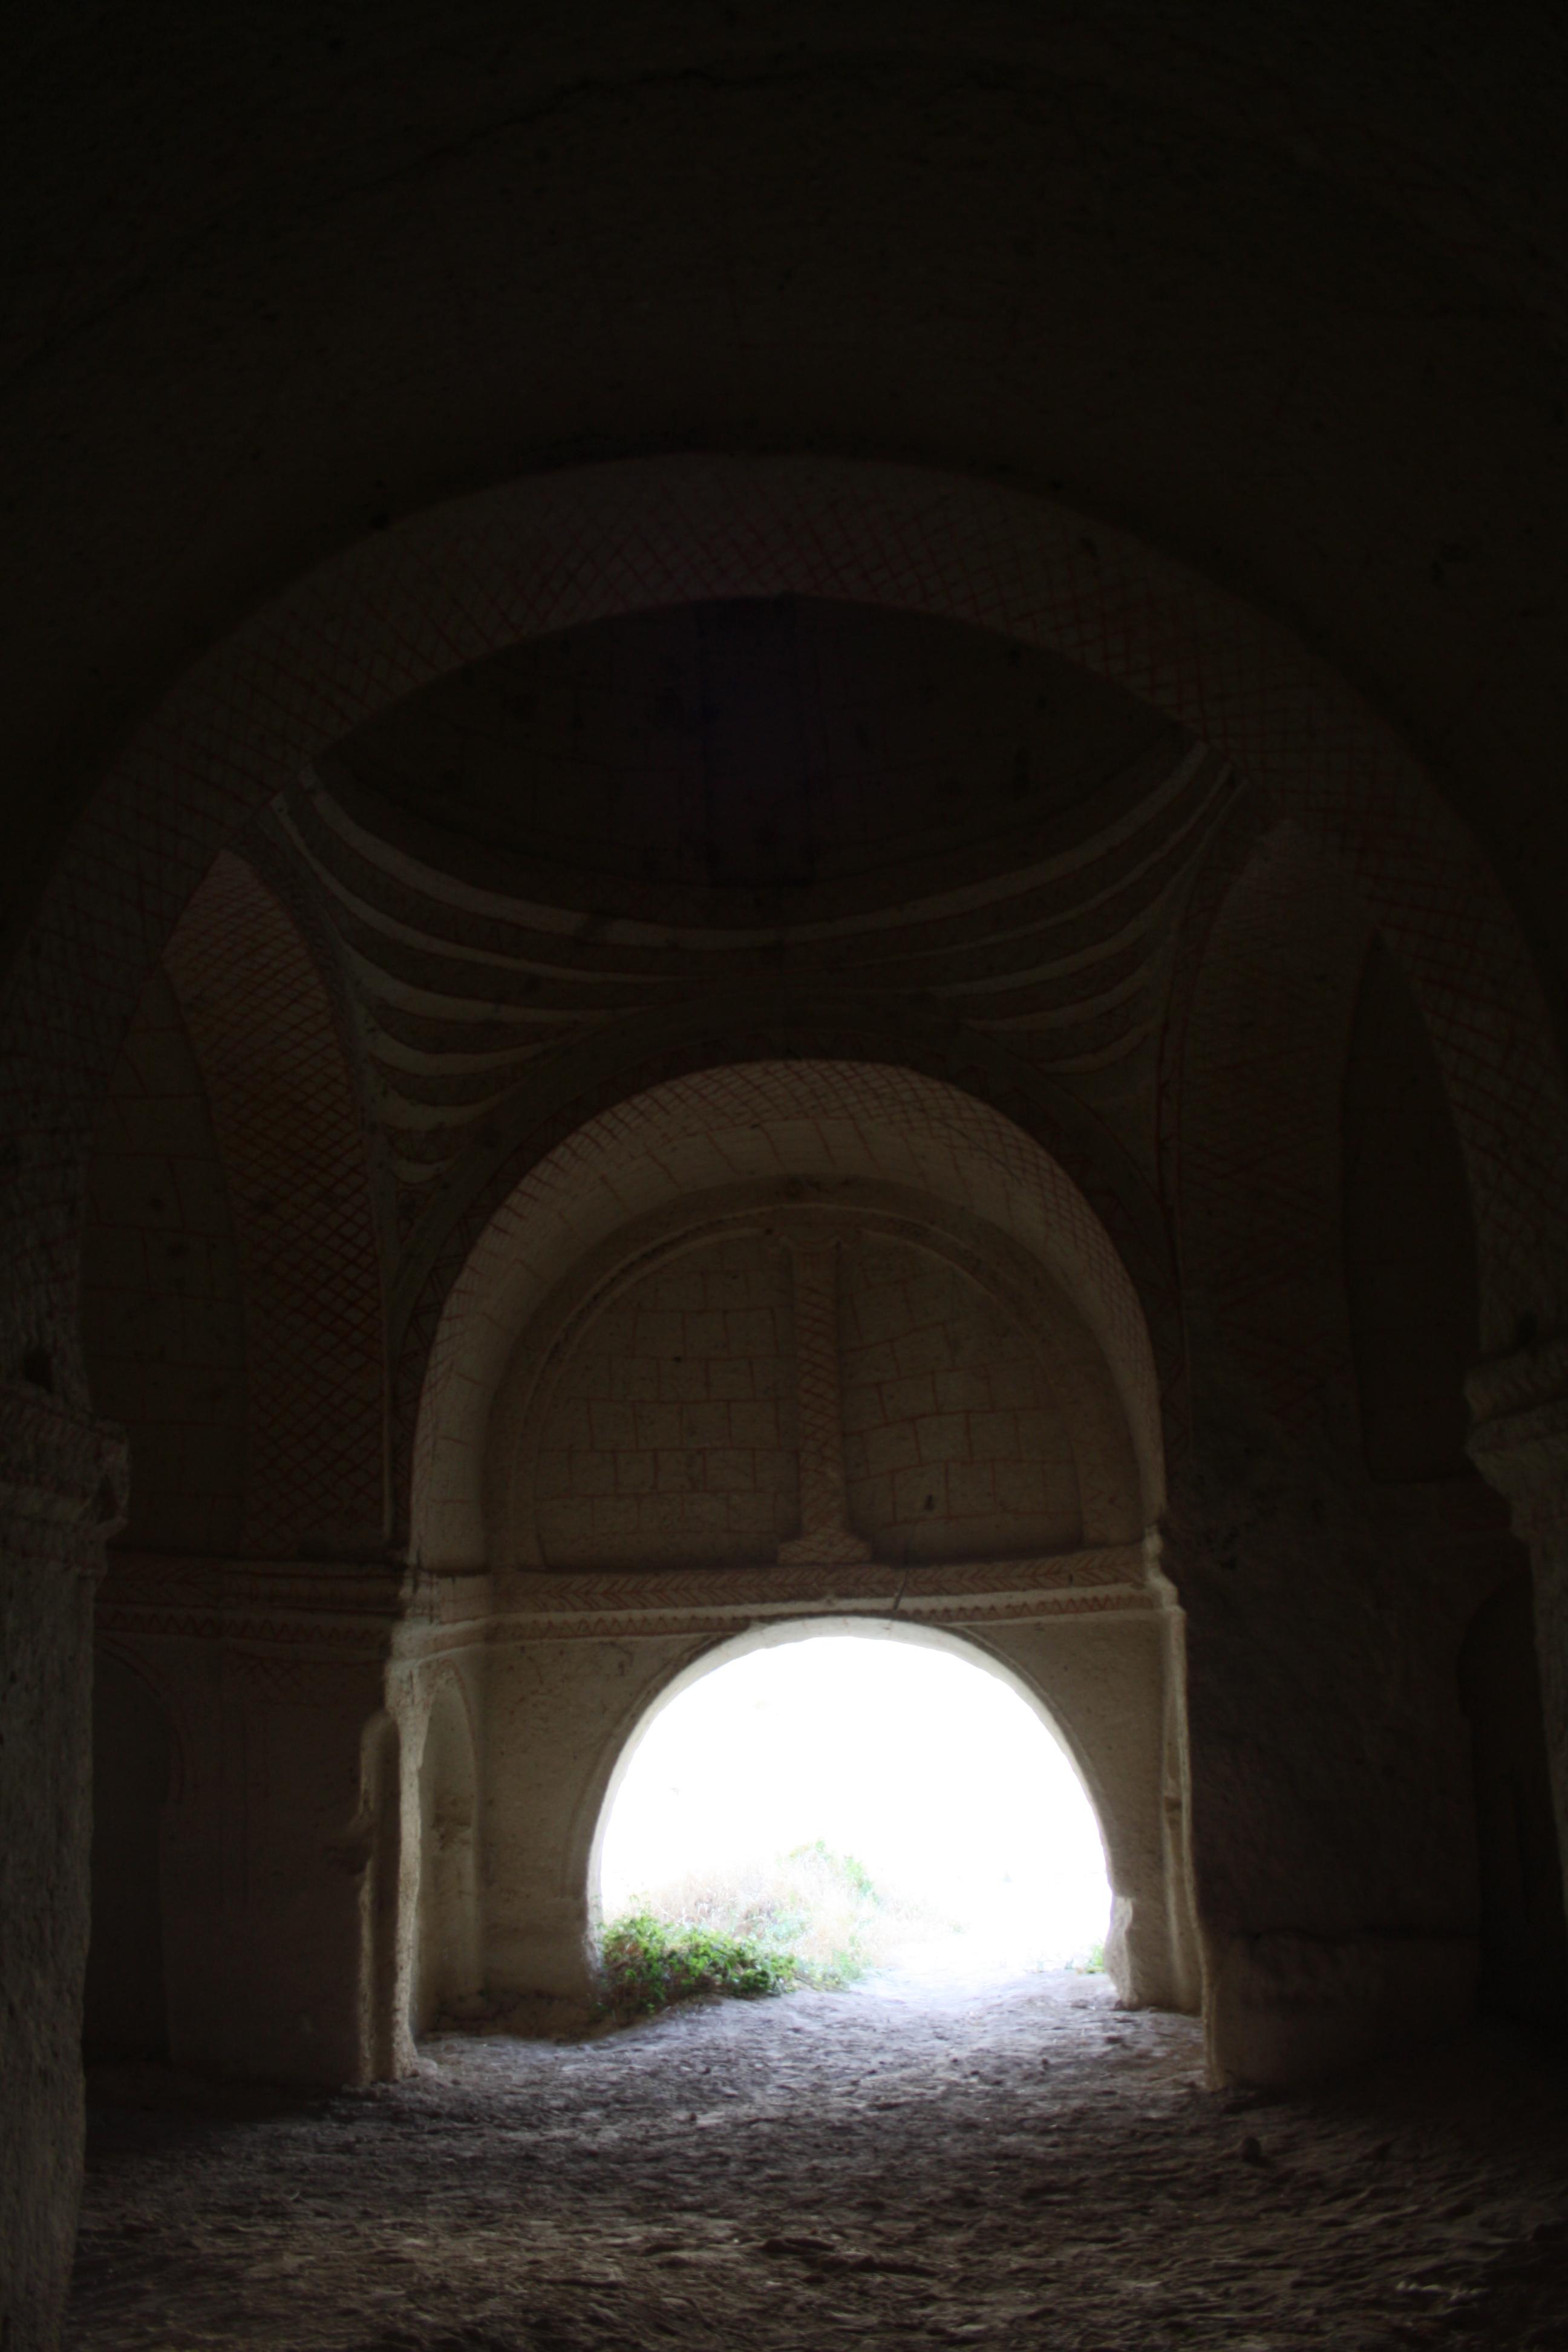 interno di una chiesa rupestre